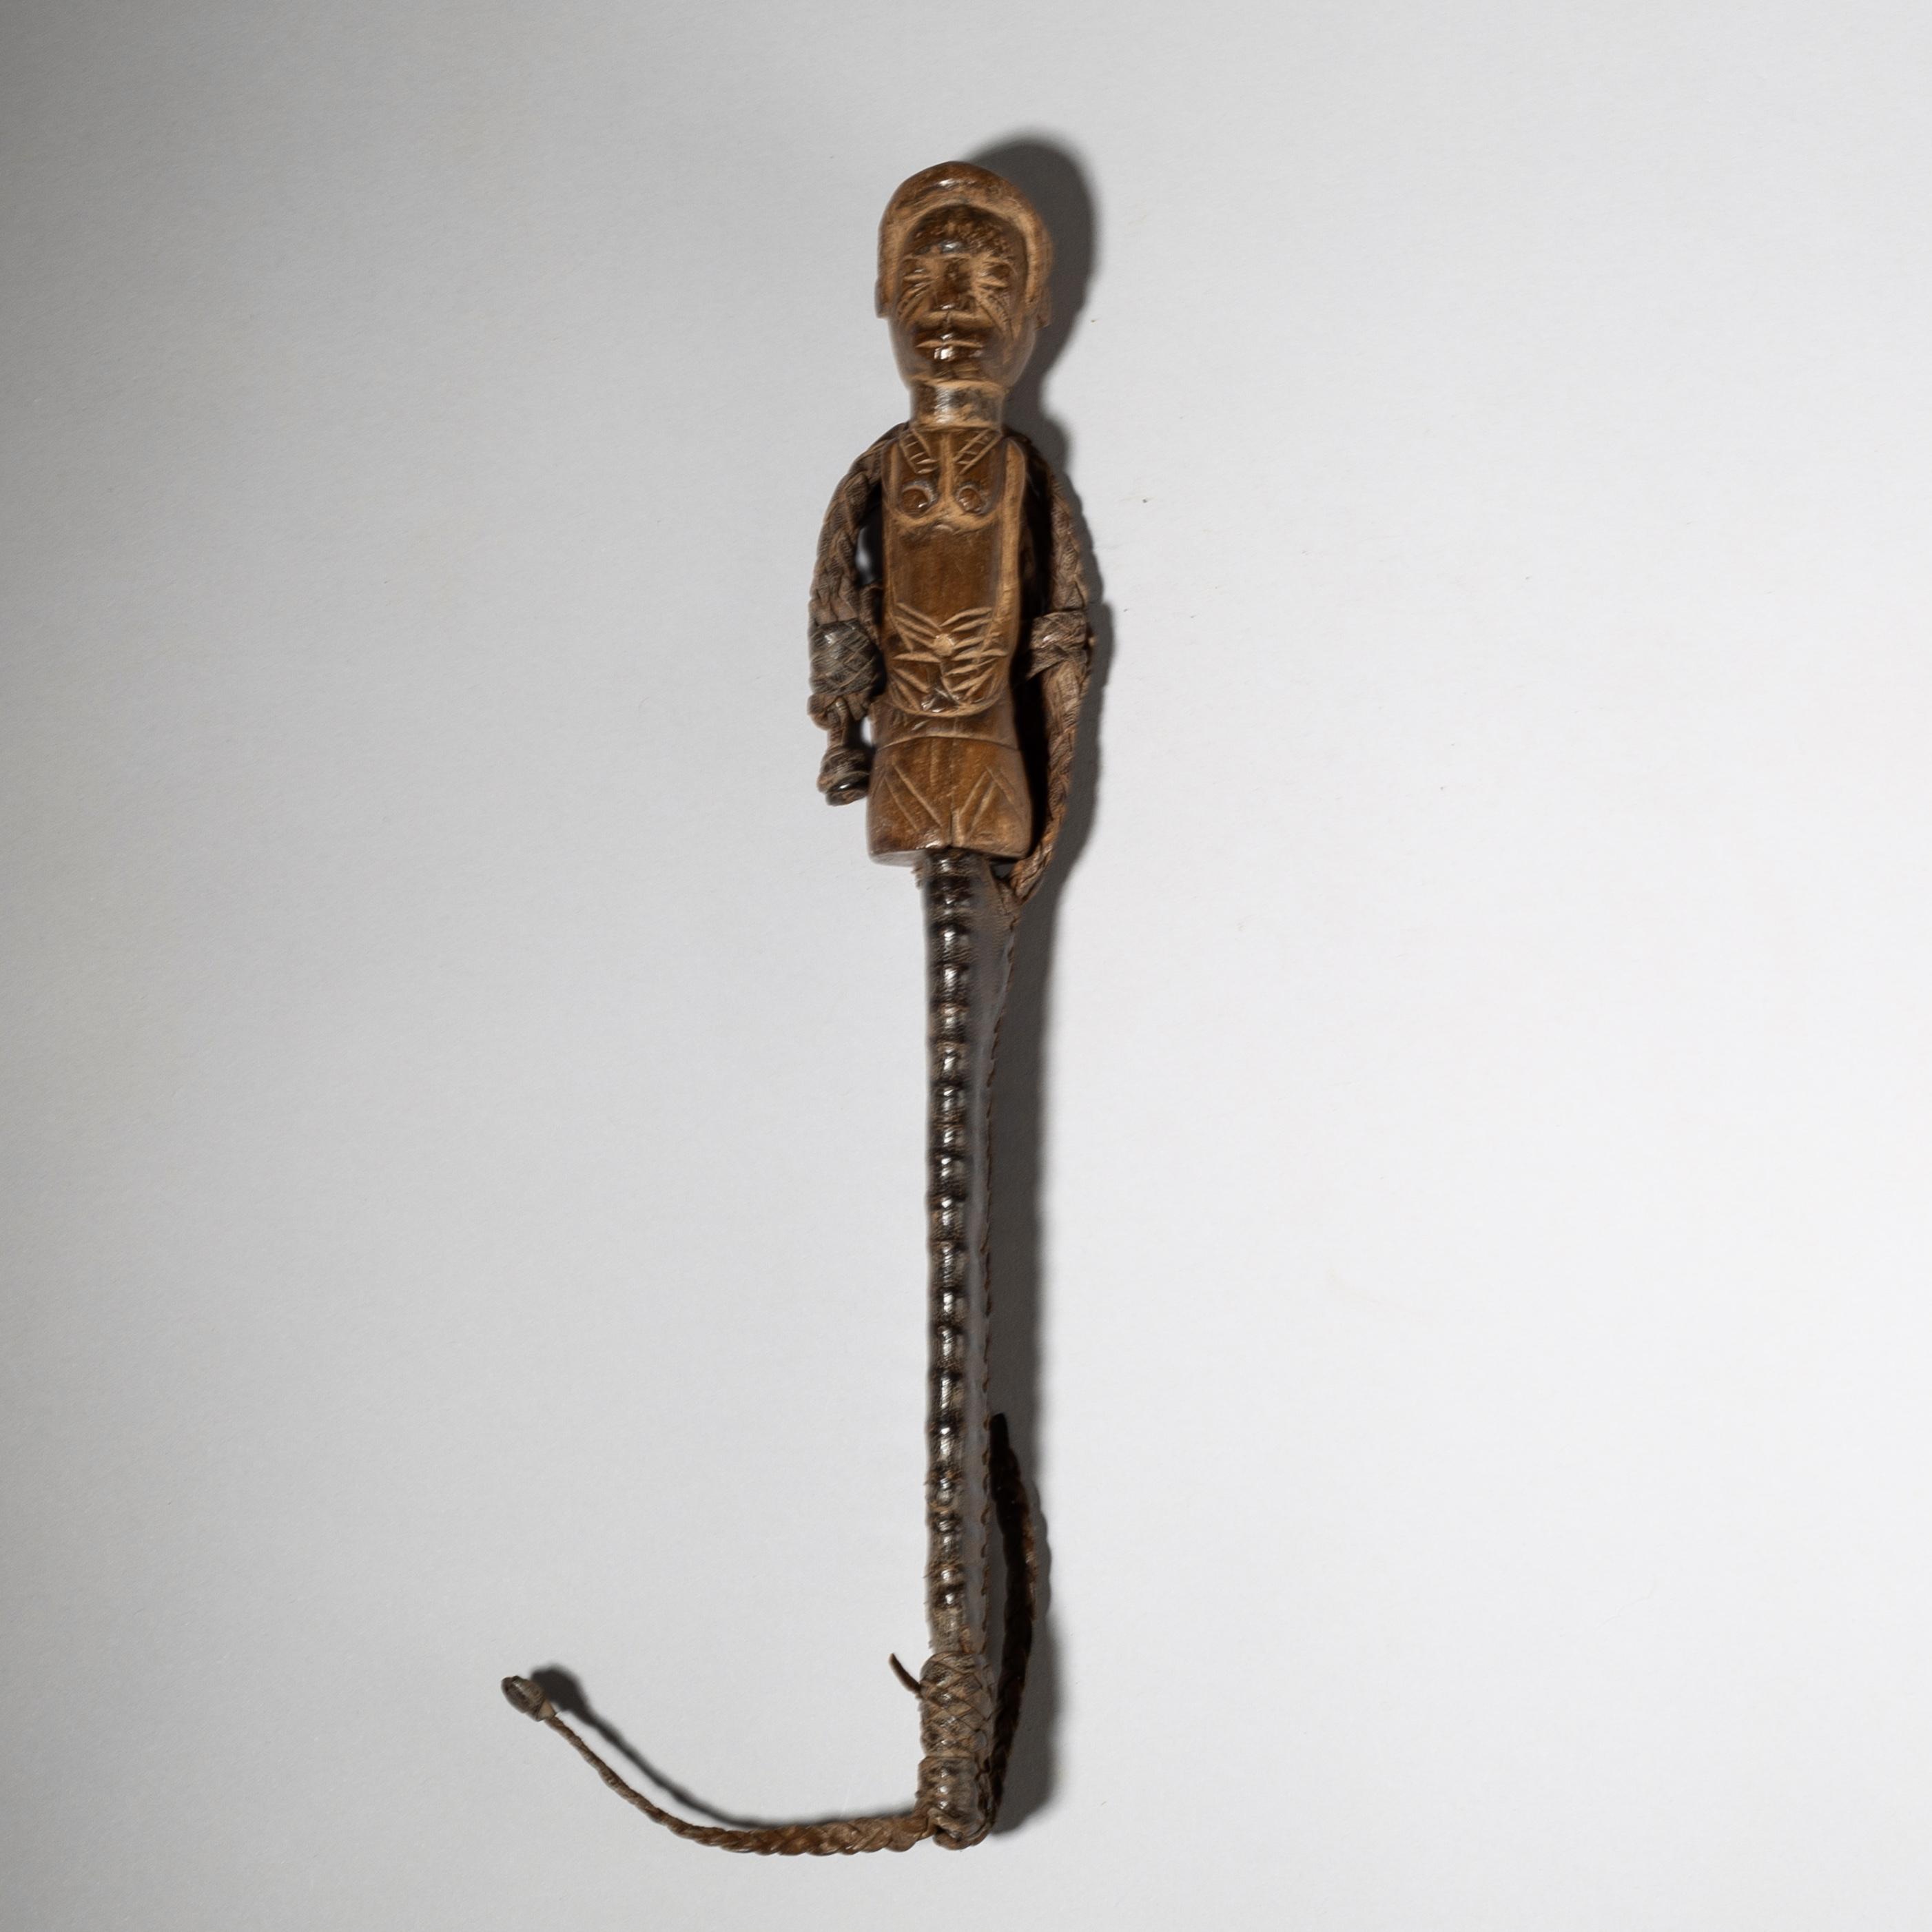 A FINE FIGURATIVE KNIFE, MOSSI TRIBE BURKINA FASO W AFRICA( No 4036)